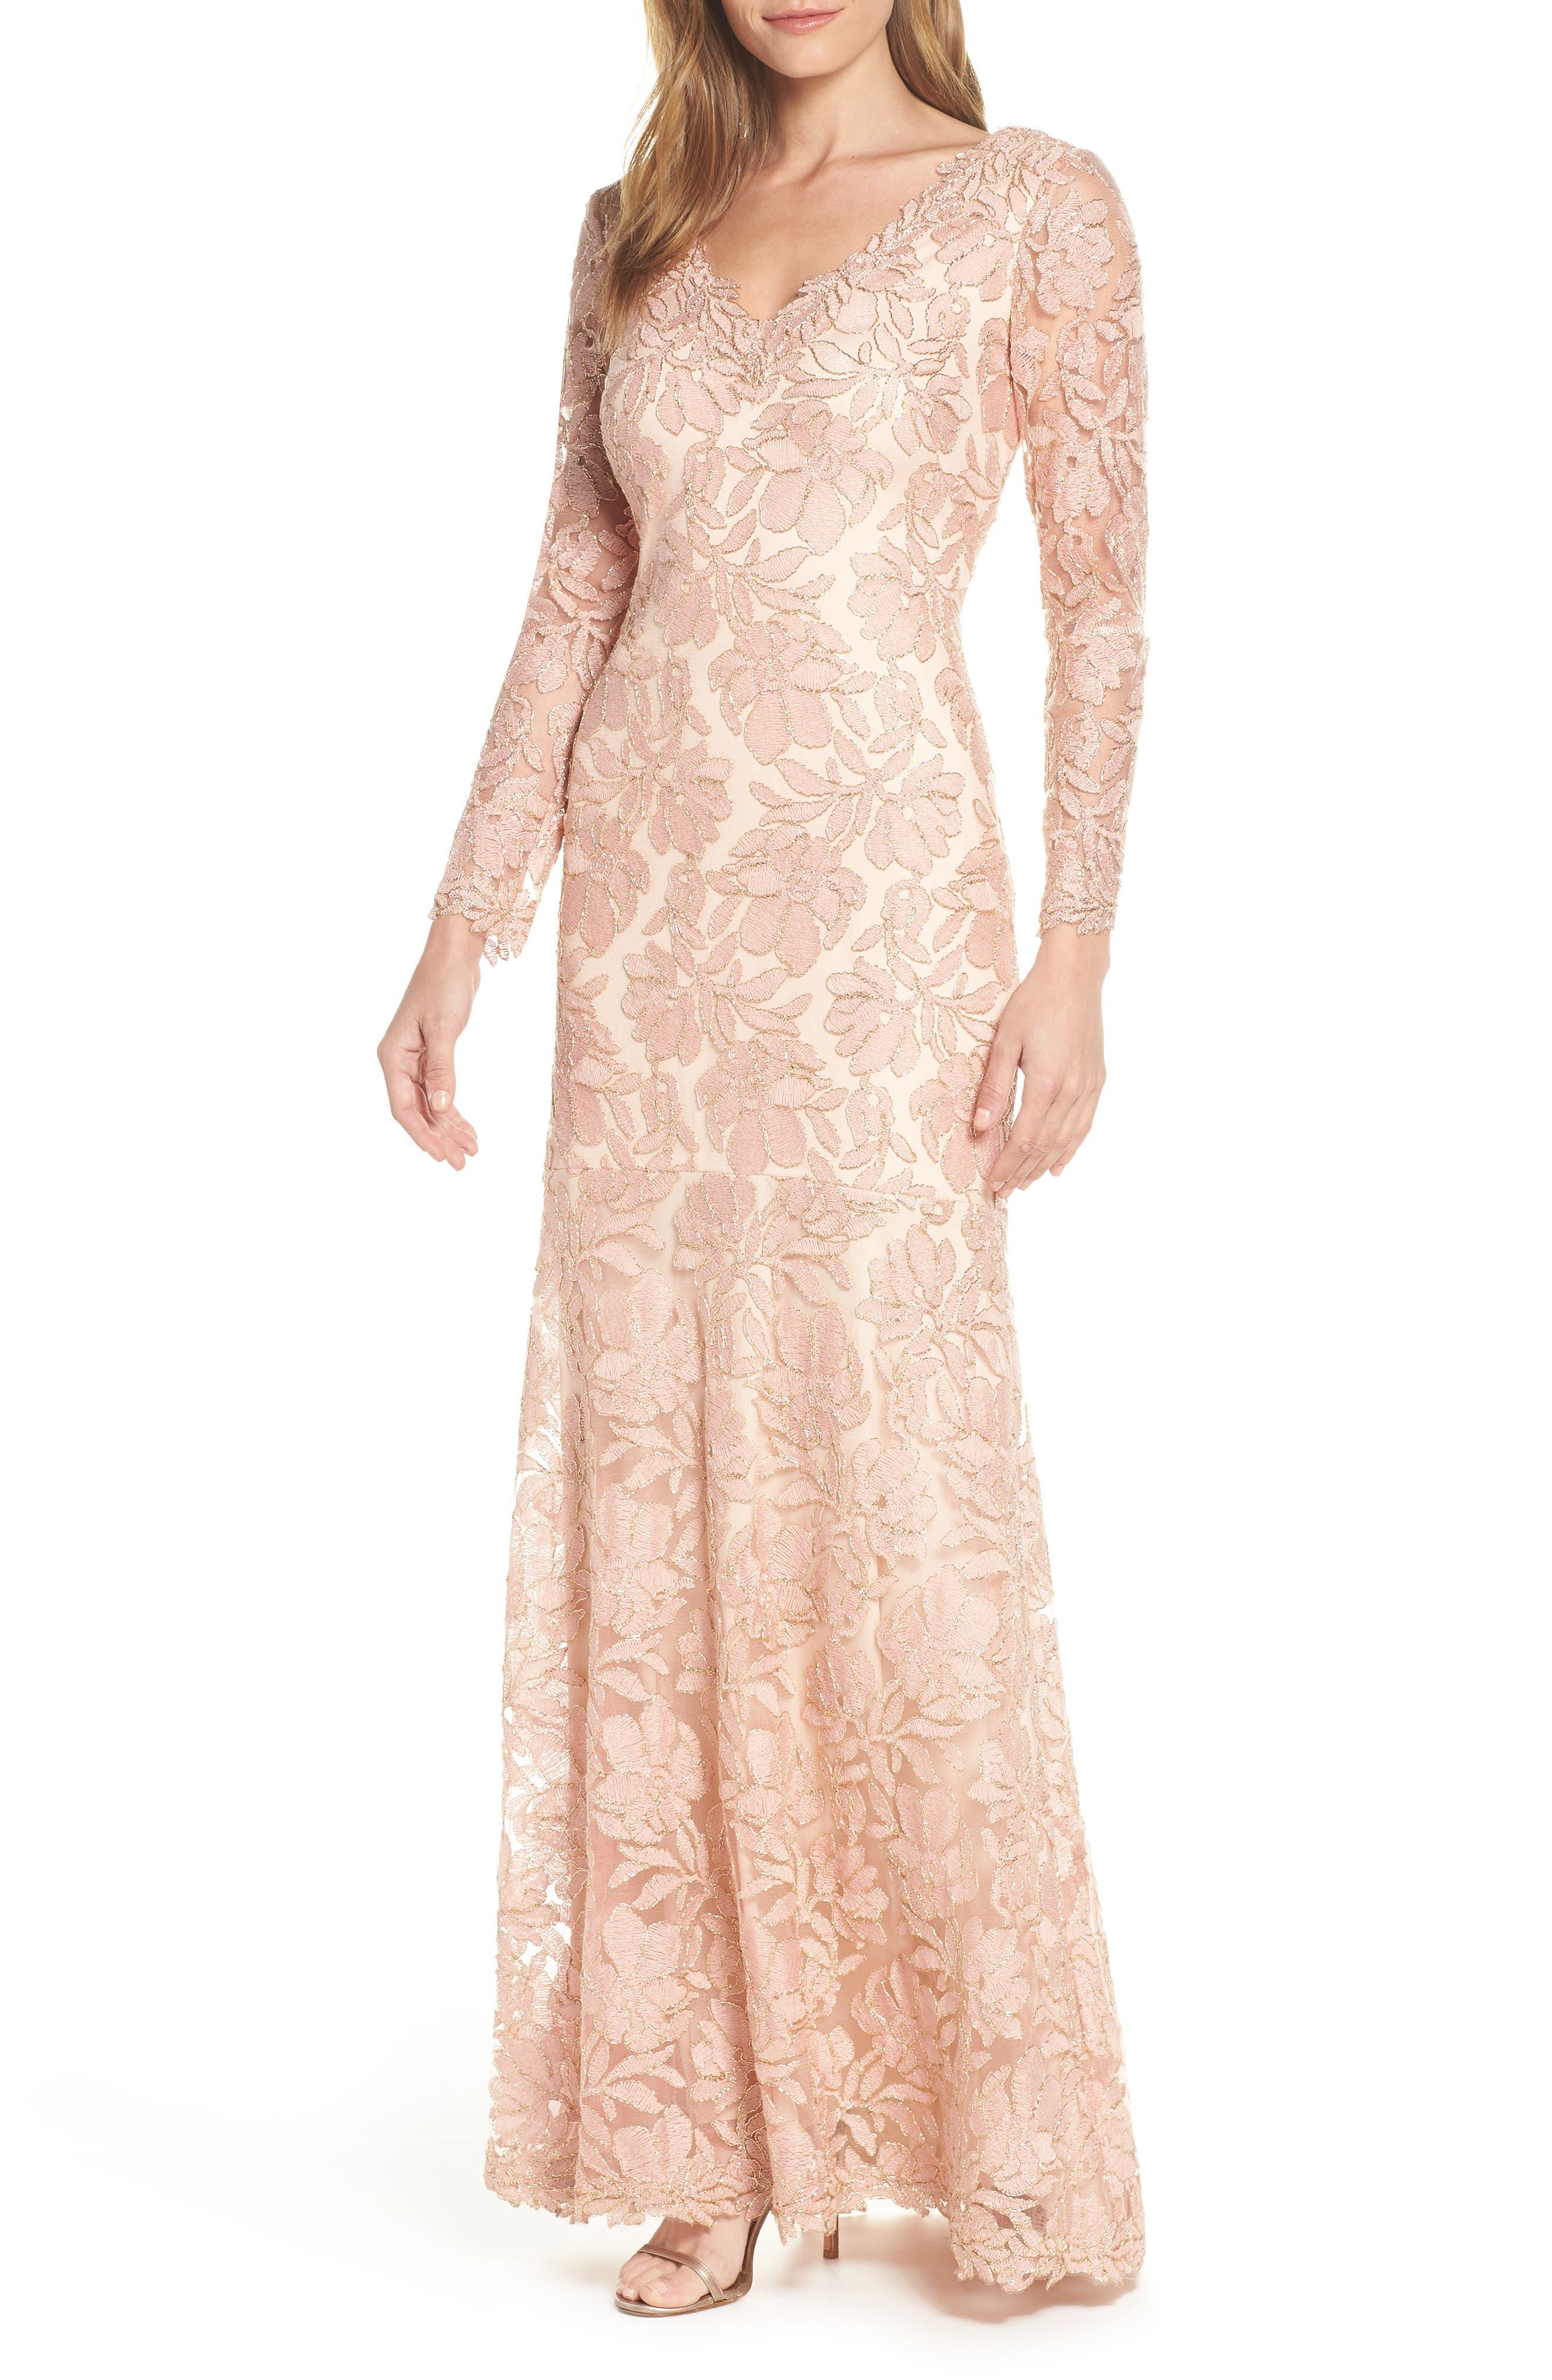 Tadashi Shoji Lace Evening Dress, Pink